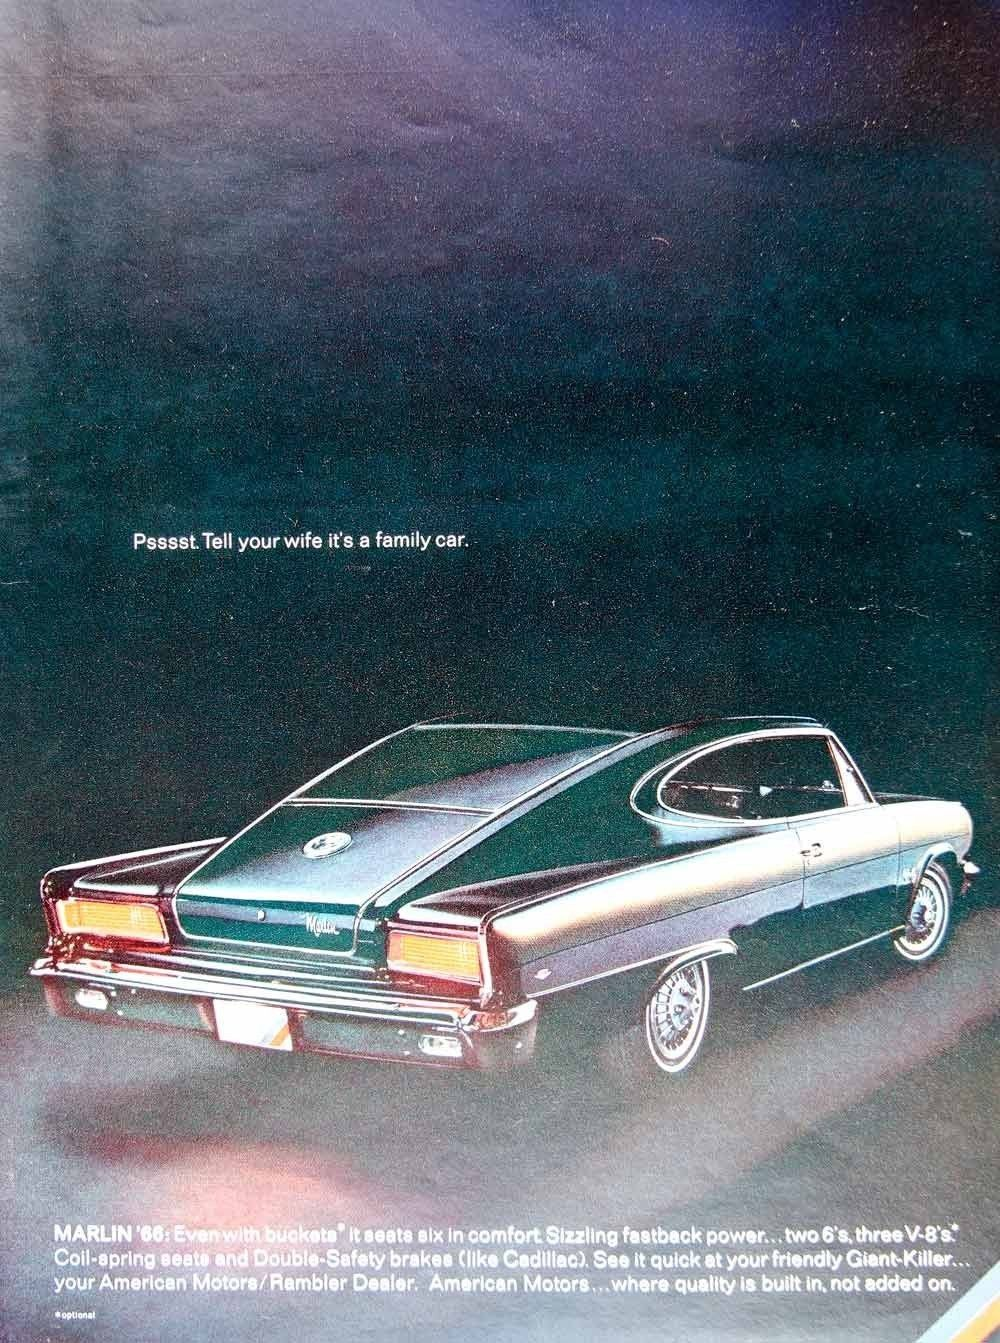 1966 AMC Rambler Marlin 2-door fastback. | Old Rides of the Past ...